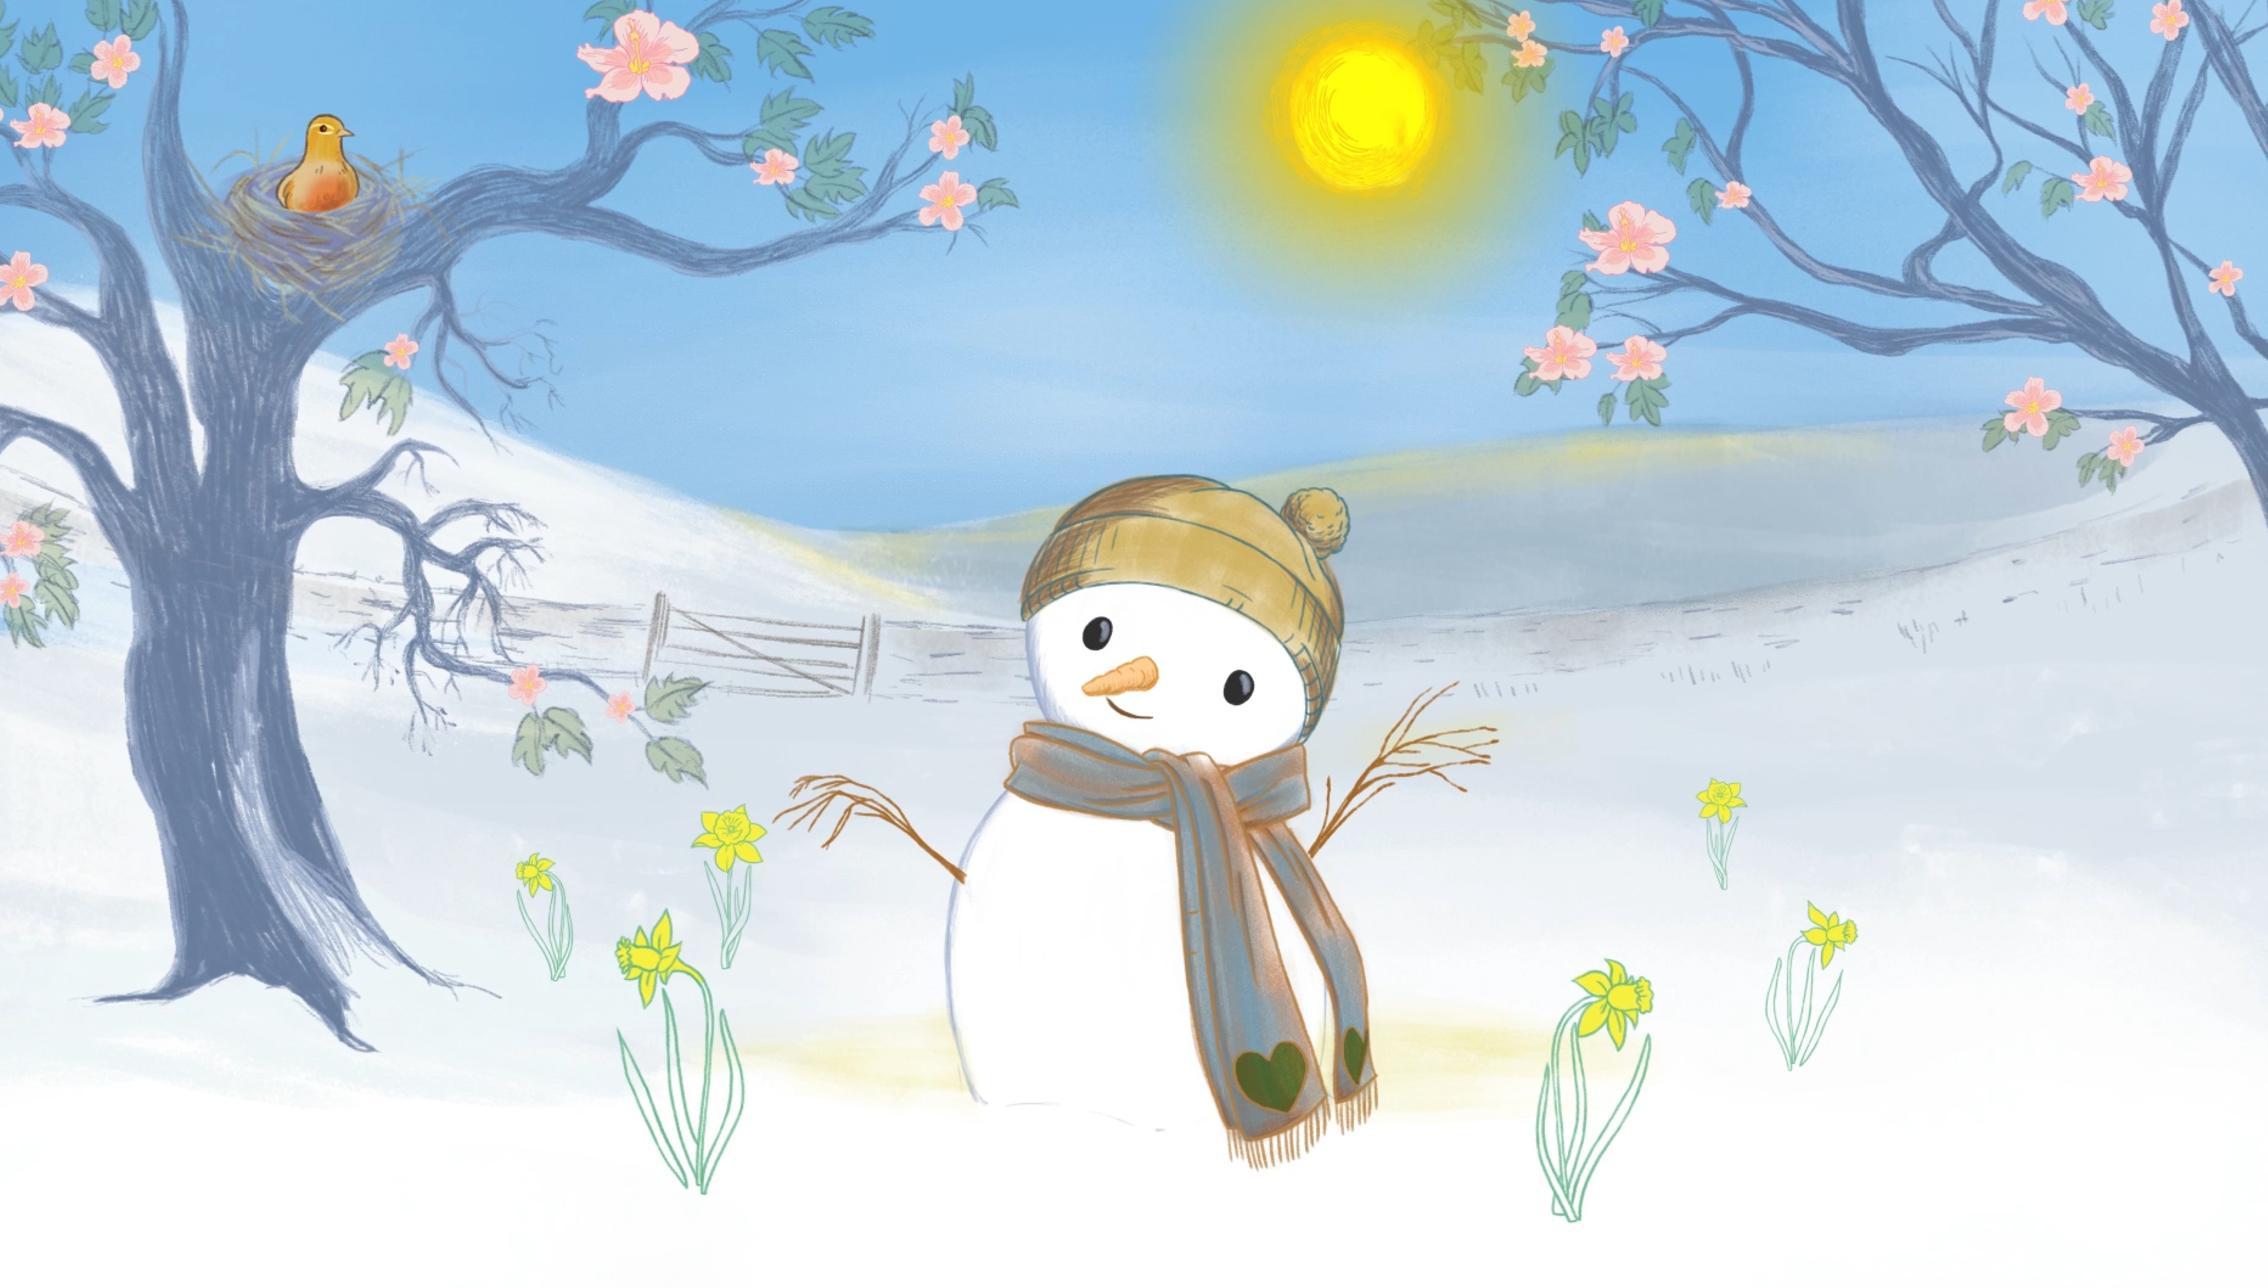 The Very Hot Snowman Still